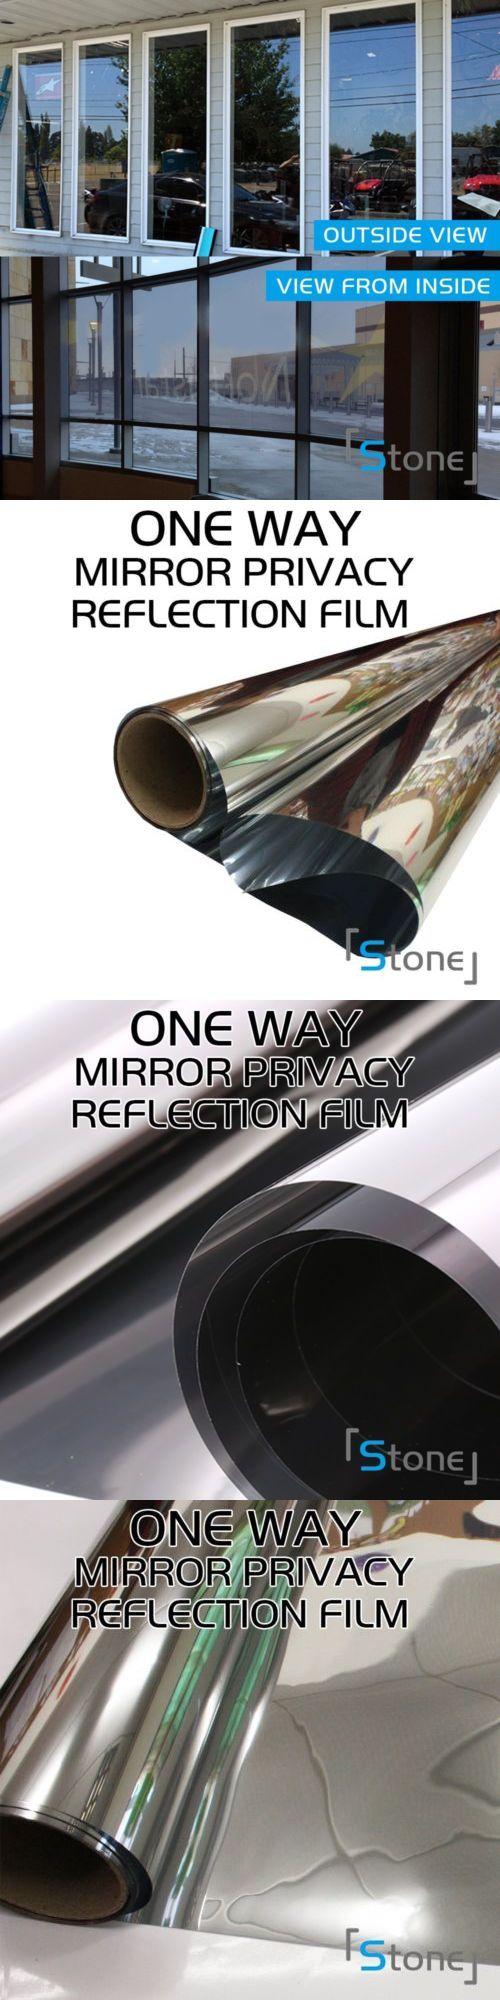 Mirror Window Tint Film One Way Privacy Static Reflective Anti Uv Kaca Oneway Premium 175757 Home Solar Buy It Now Only 8599 On Ebay